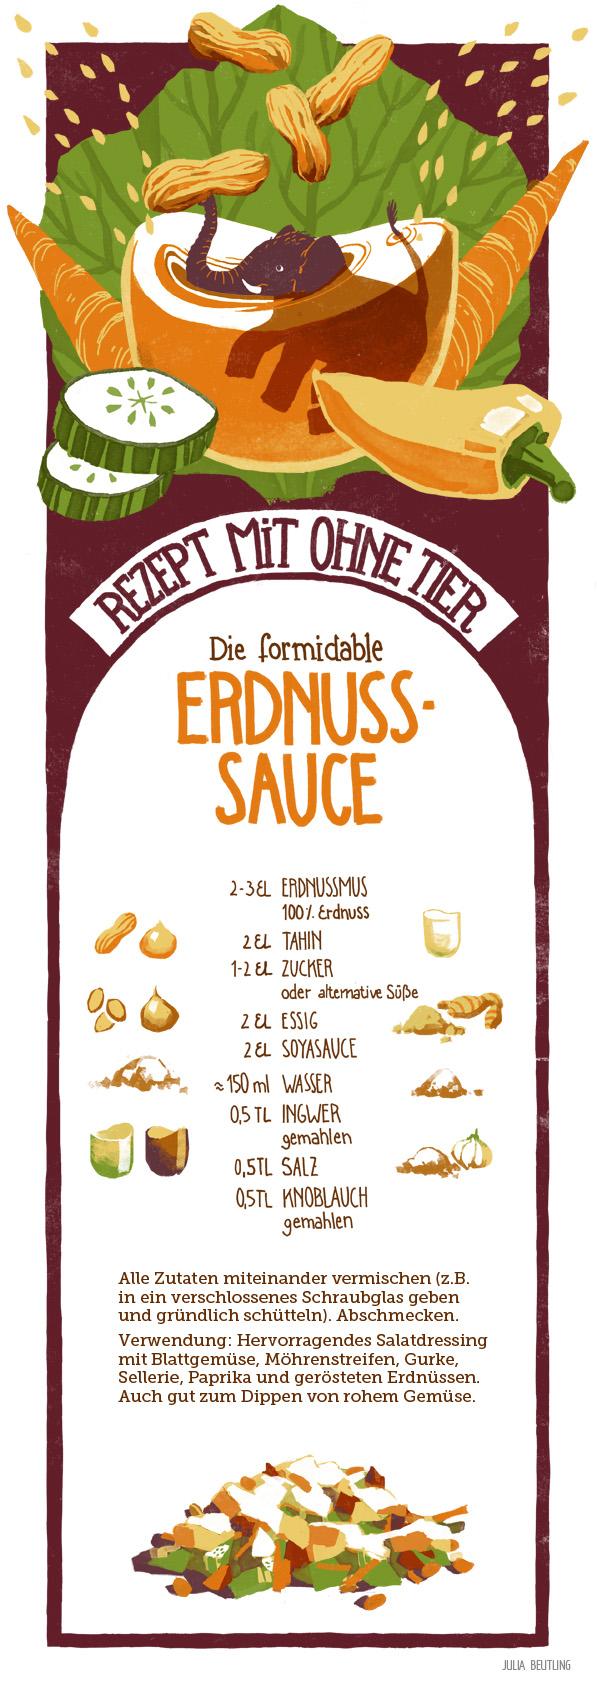 WEB rezept 2B DE erdnuss sauce julia beutling